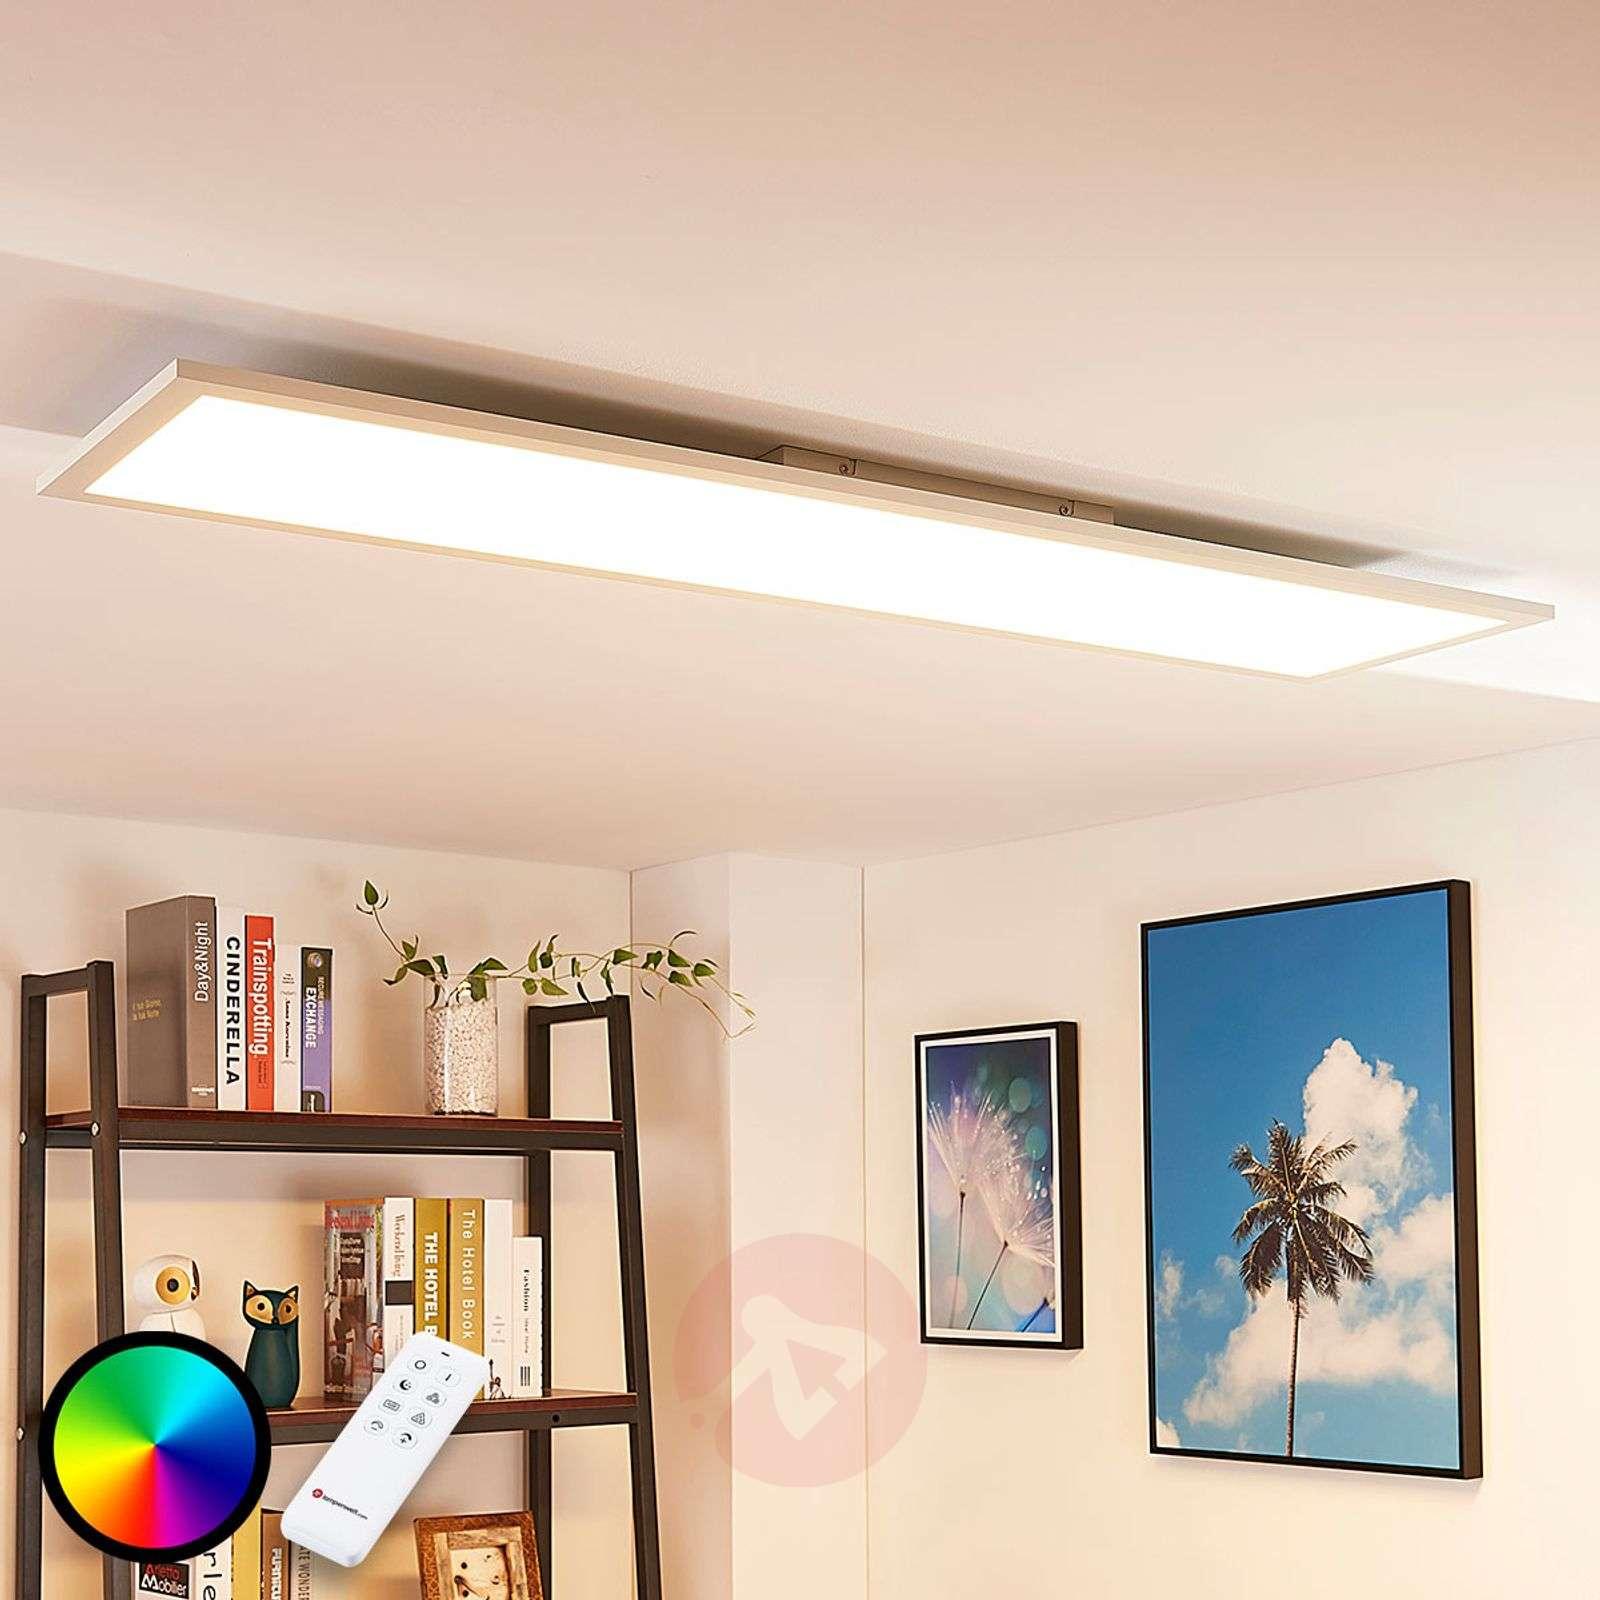 Long LED ceiling light Tinus, RGB and warm white_9621654_1